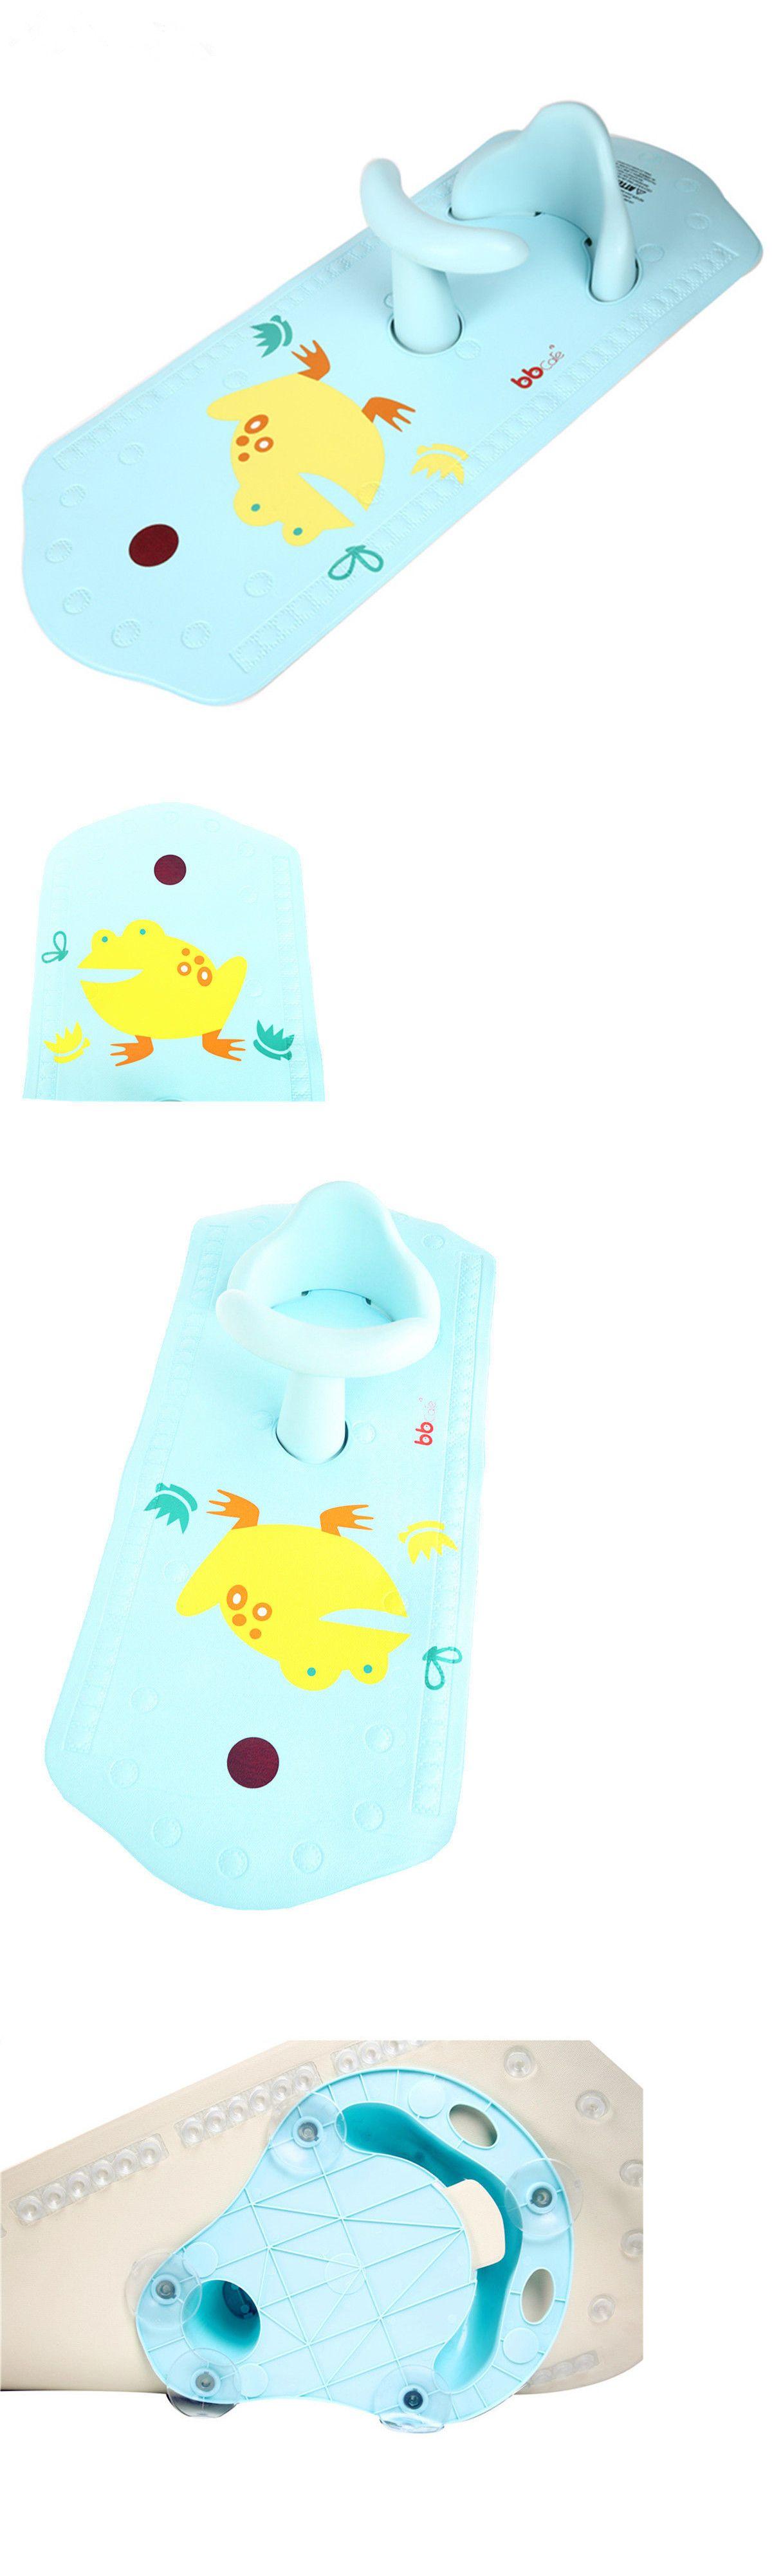 Enchanting Baby Bath Rings Component - Bathtub Ideas - dilata.info